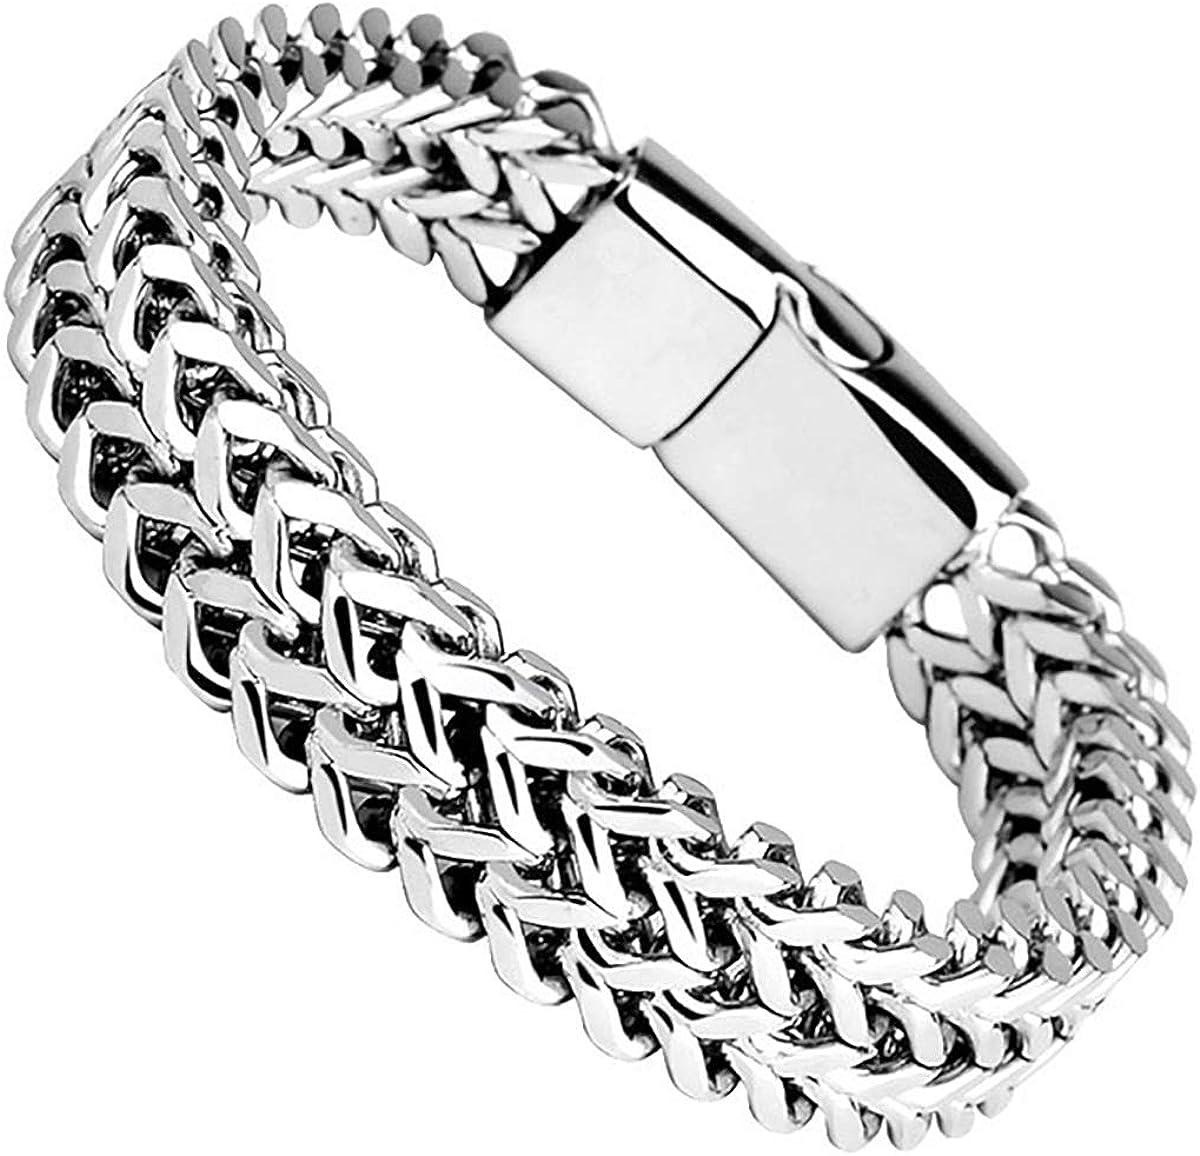 sale SPARKL Jewellry Max 49% OFF Stainless Steel Men Buckle Magnet Titanium